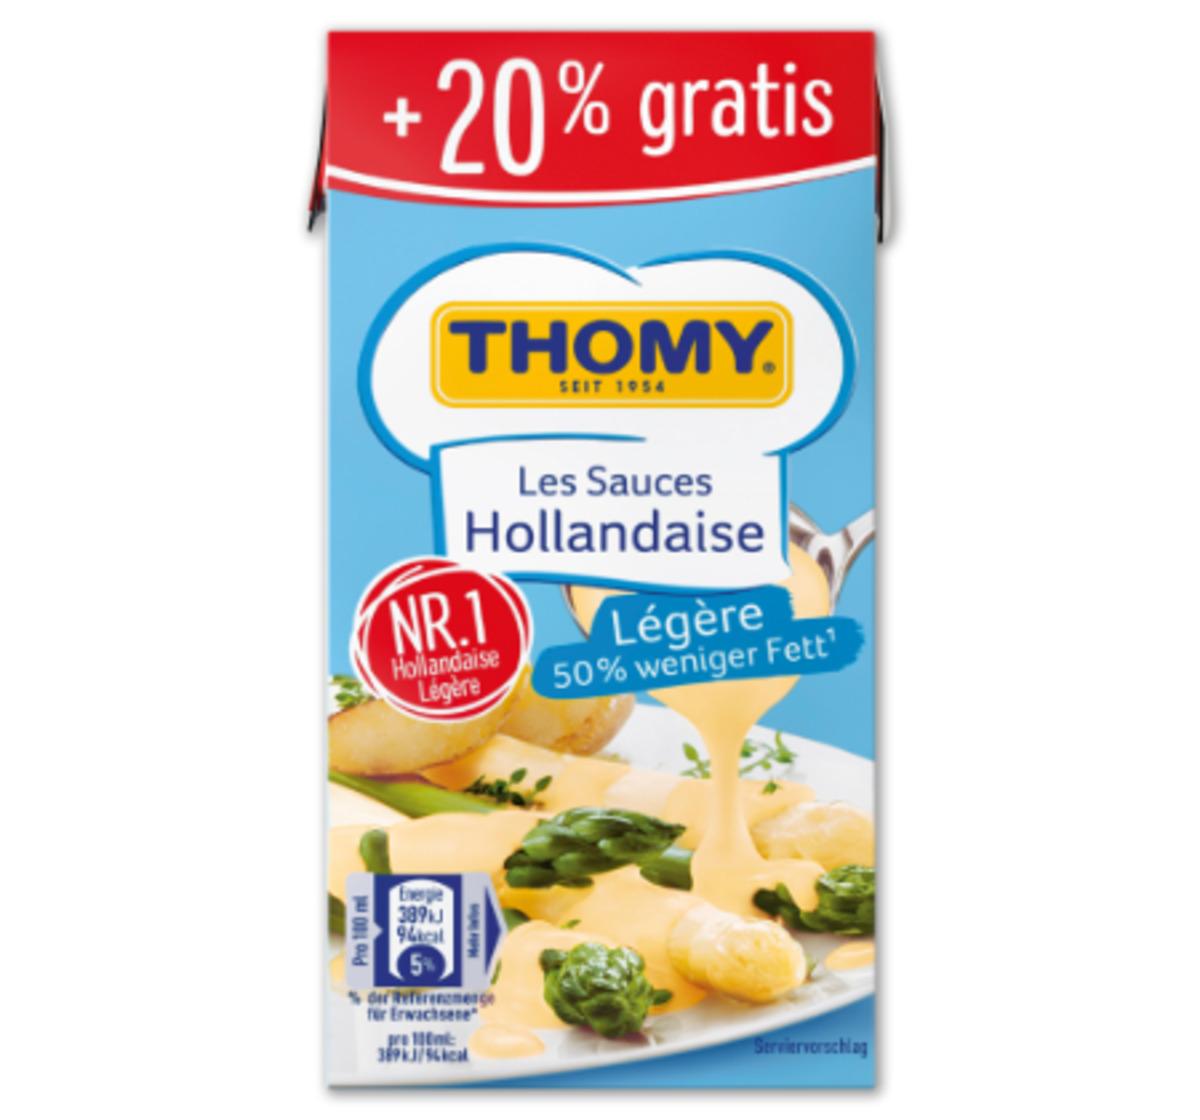 Bild 2 von THOMY Les Sauces Hollandaise